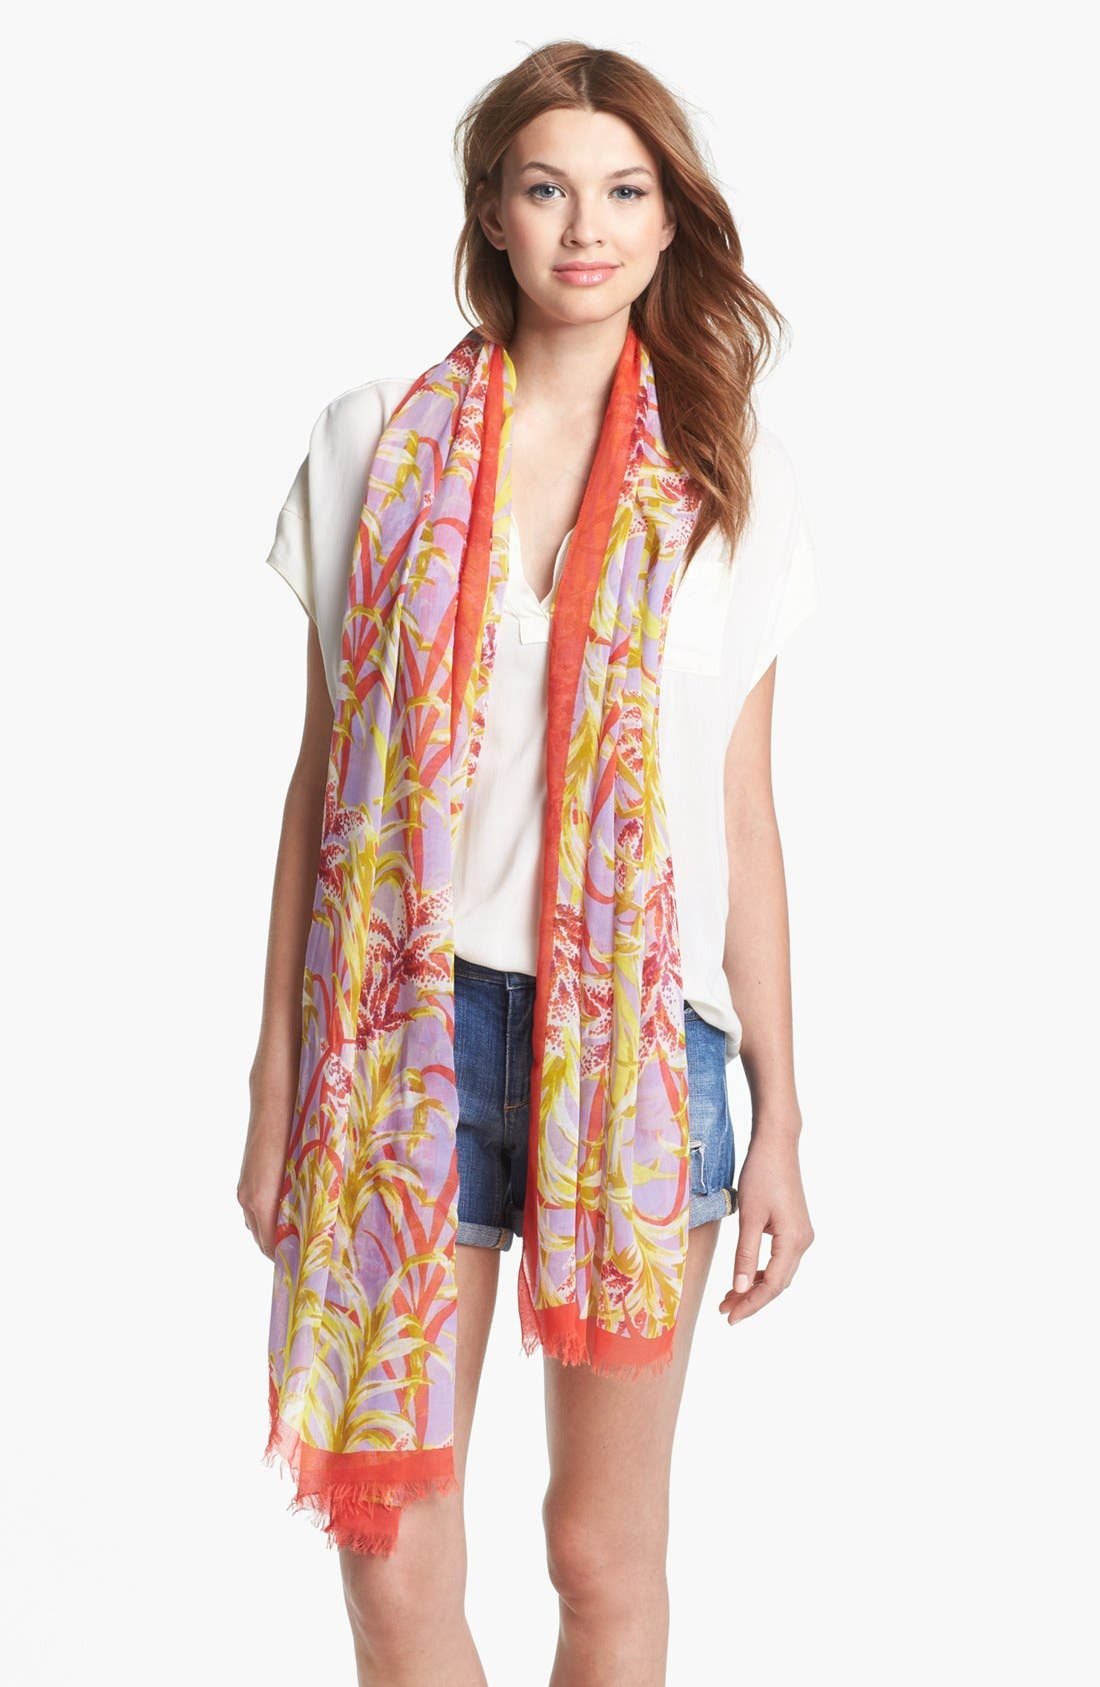 Main Image - kate spade new york 'ginger floral' scarf